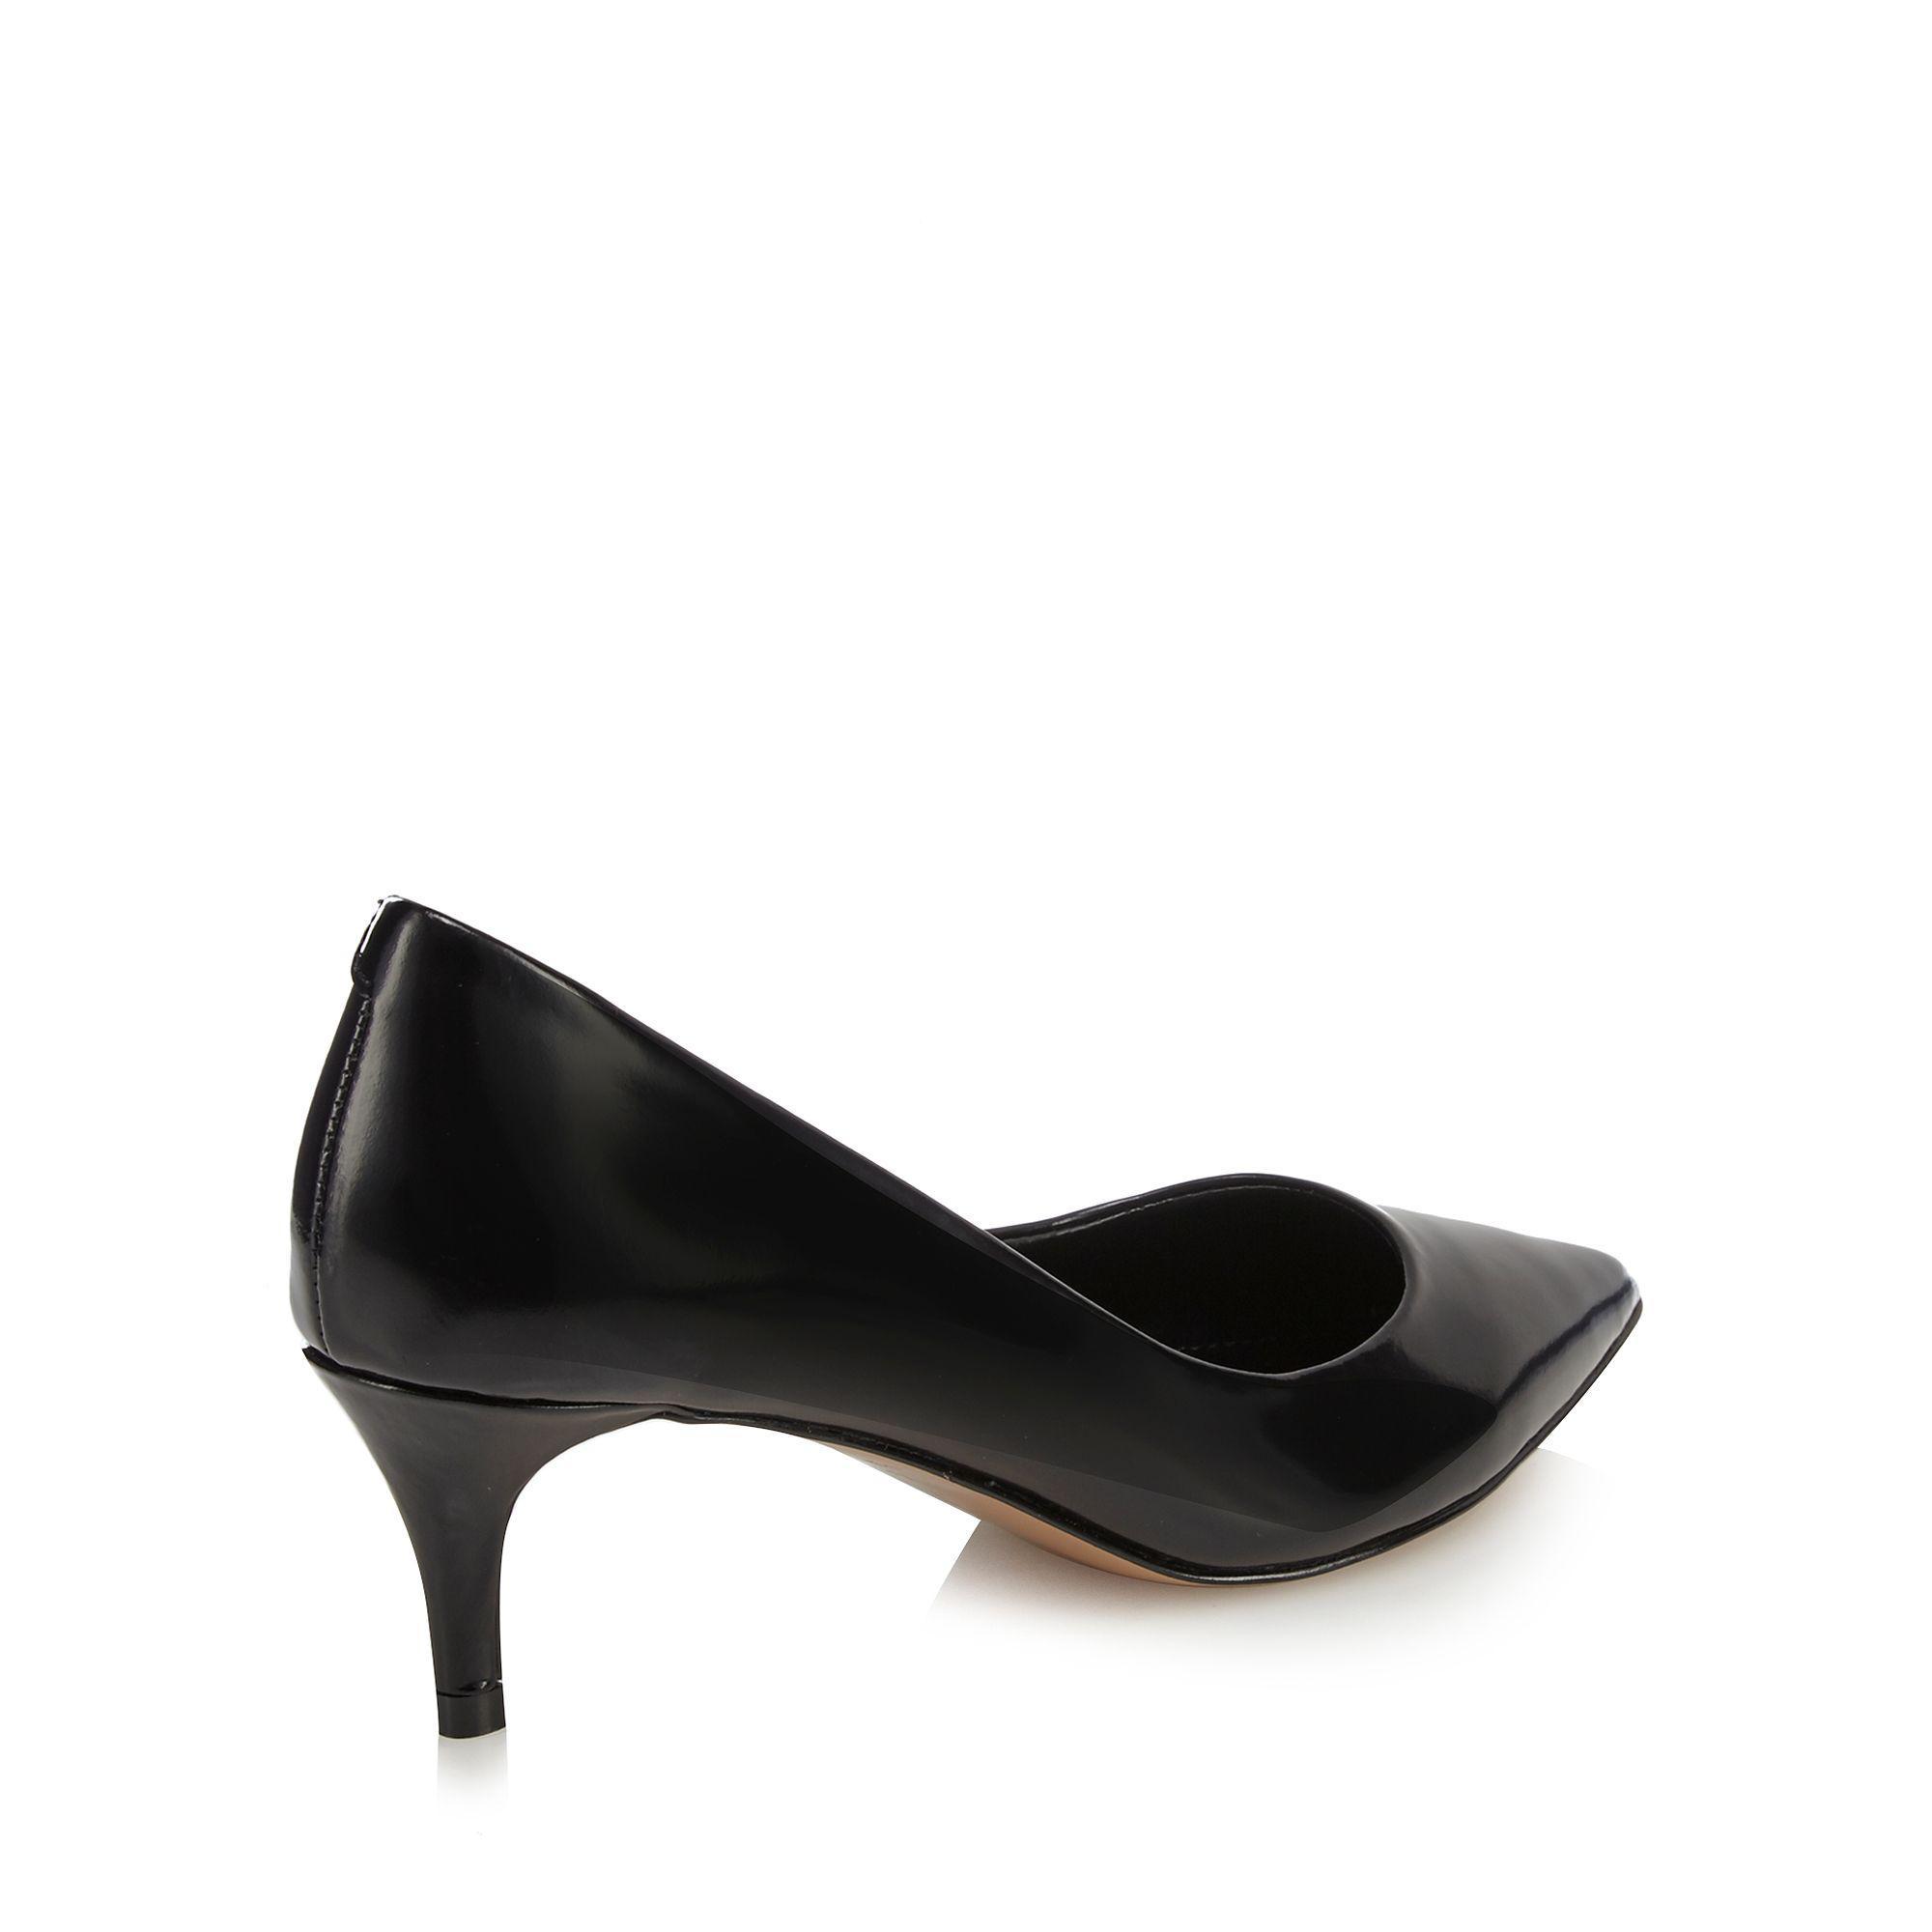 0ce9cfc5a3f J By Jasper Conran Black Leather  jess  Mid Kitten Heel Court Shoes ...